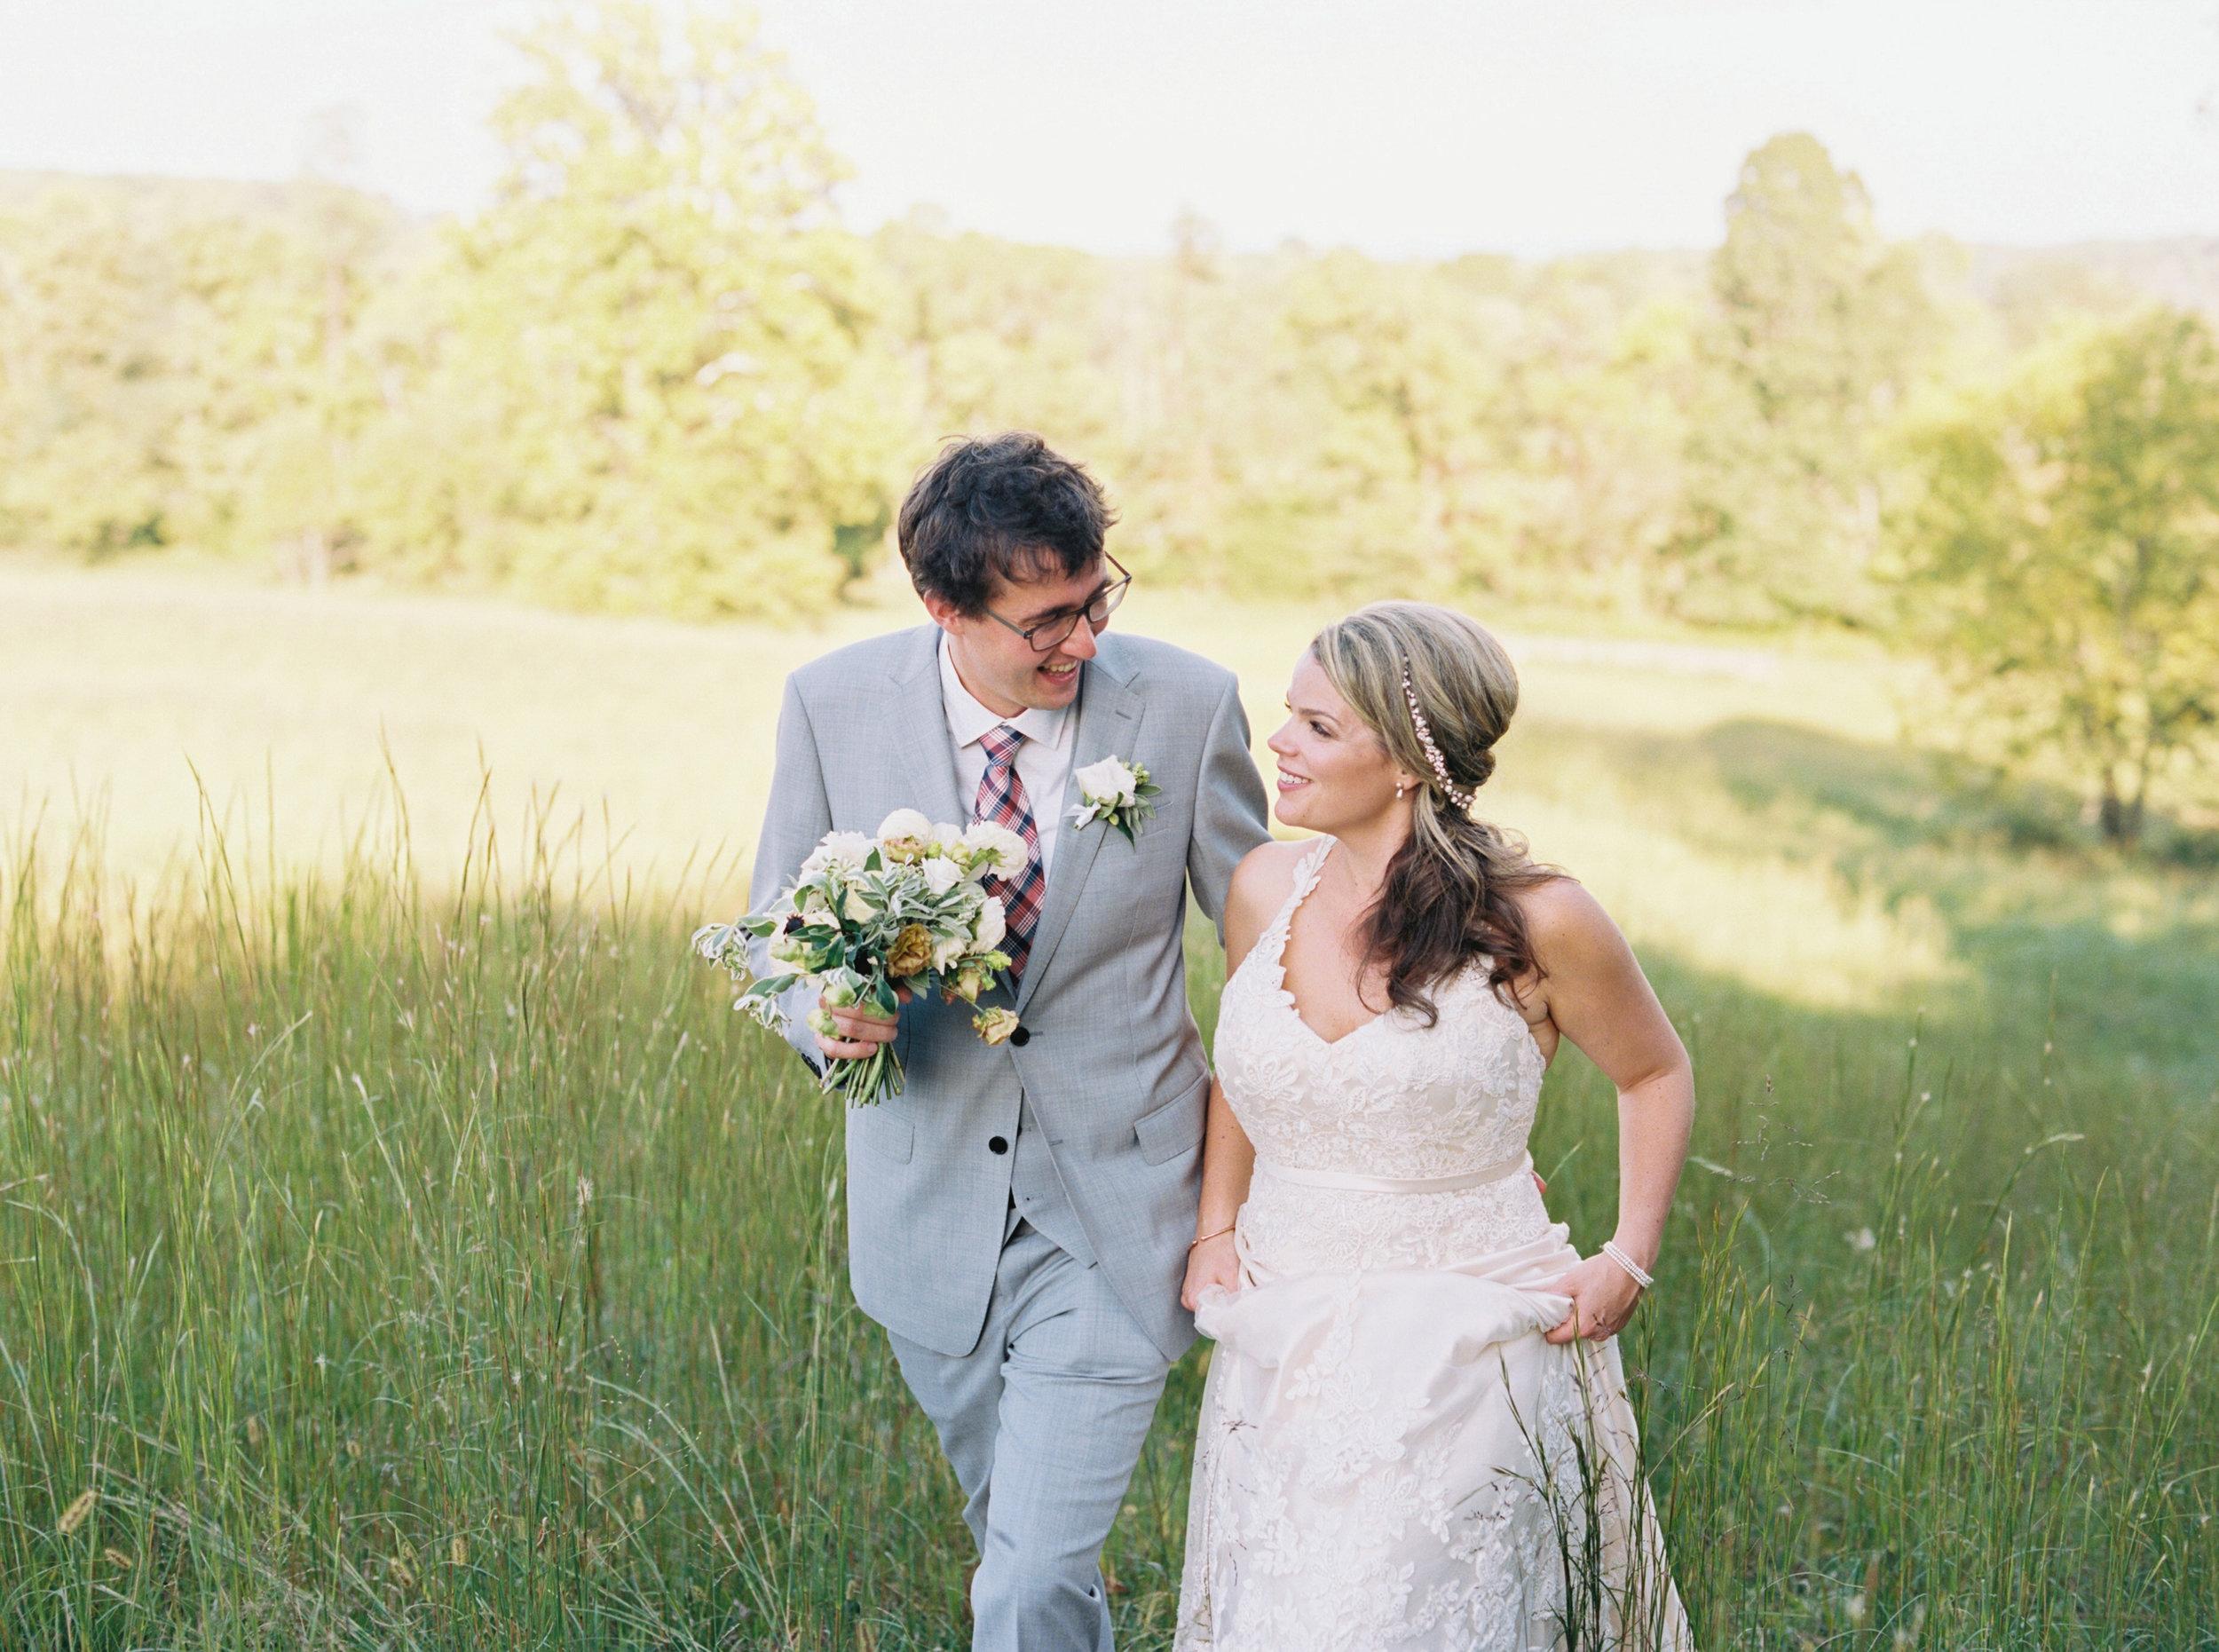 Abby_Simon_Wedding_Abigail_Malone_Photography_nashville_Bloomsbury_Farm-389.jpg